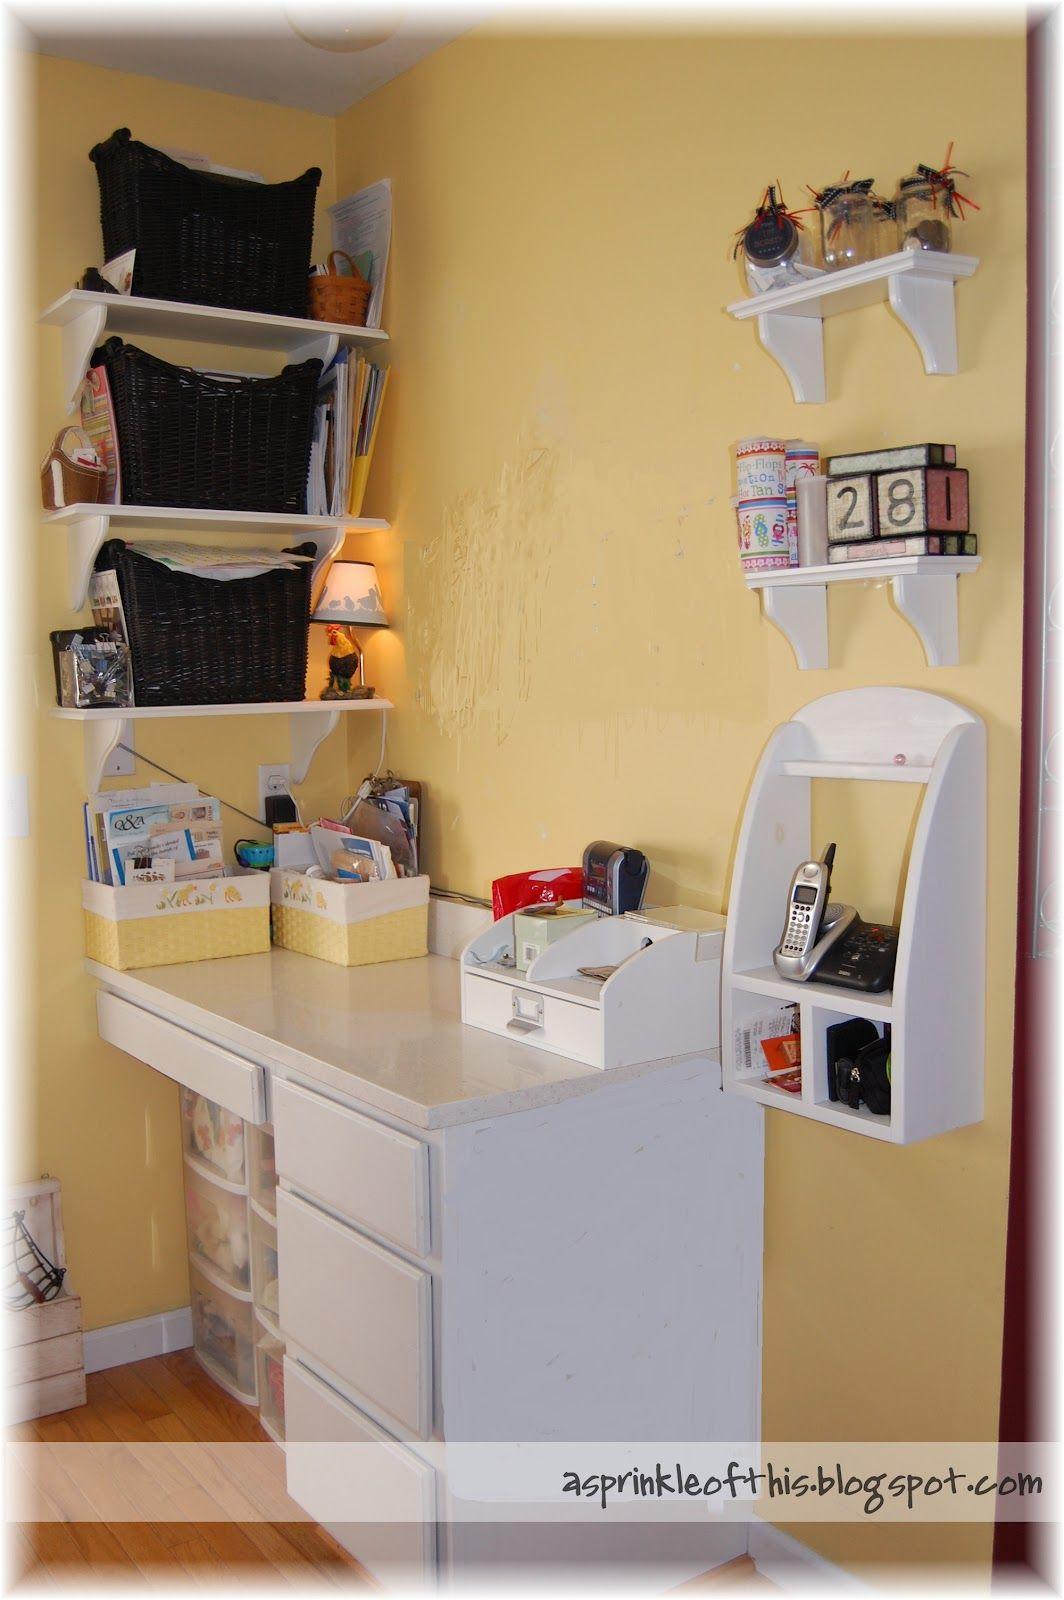 An Organized Kitchen Desk . . . . Tips For Organized Recipe Books, Plants,